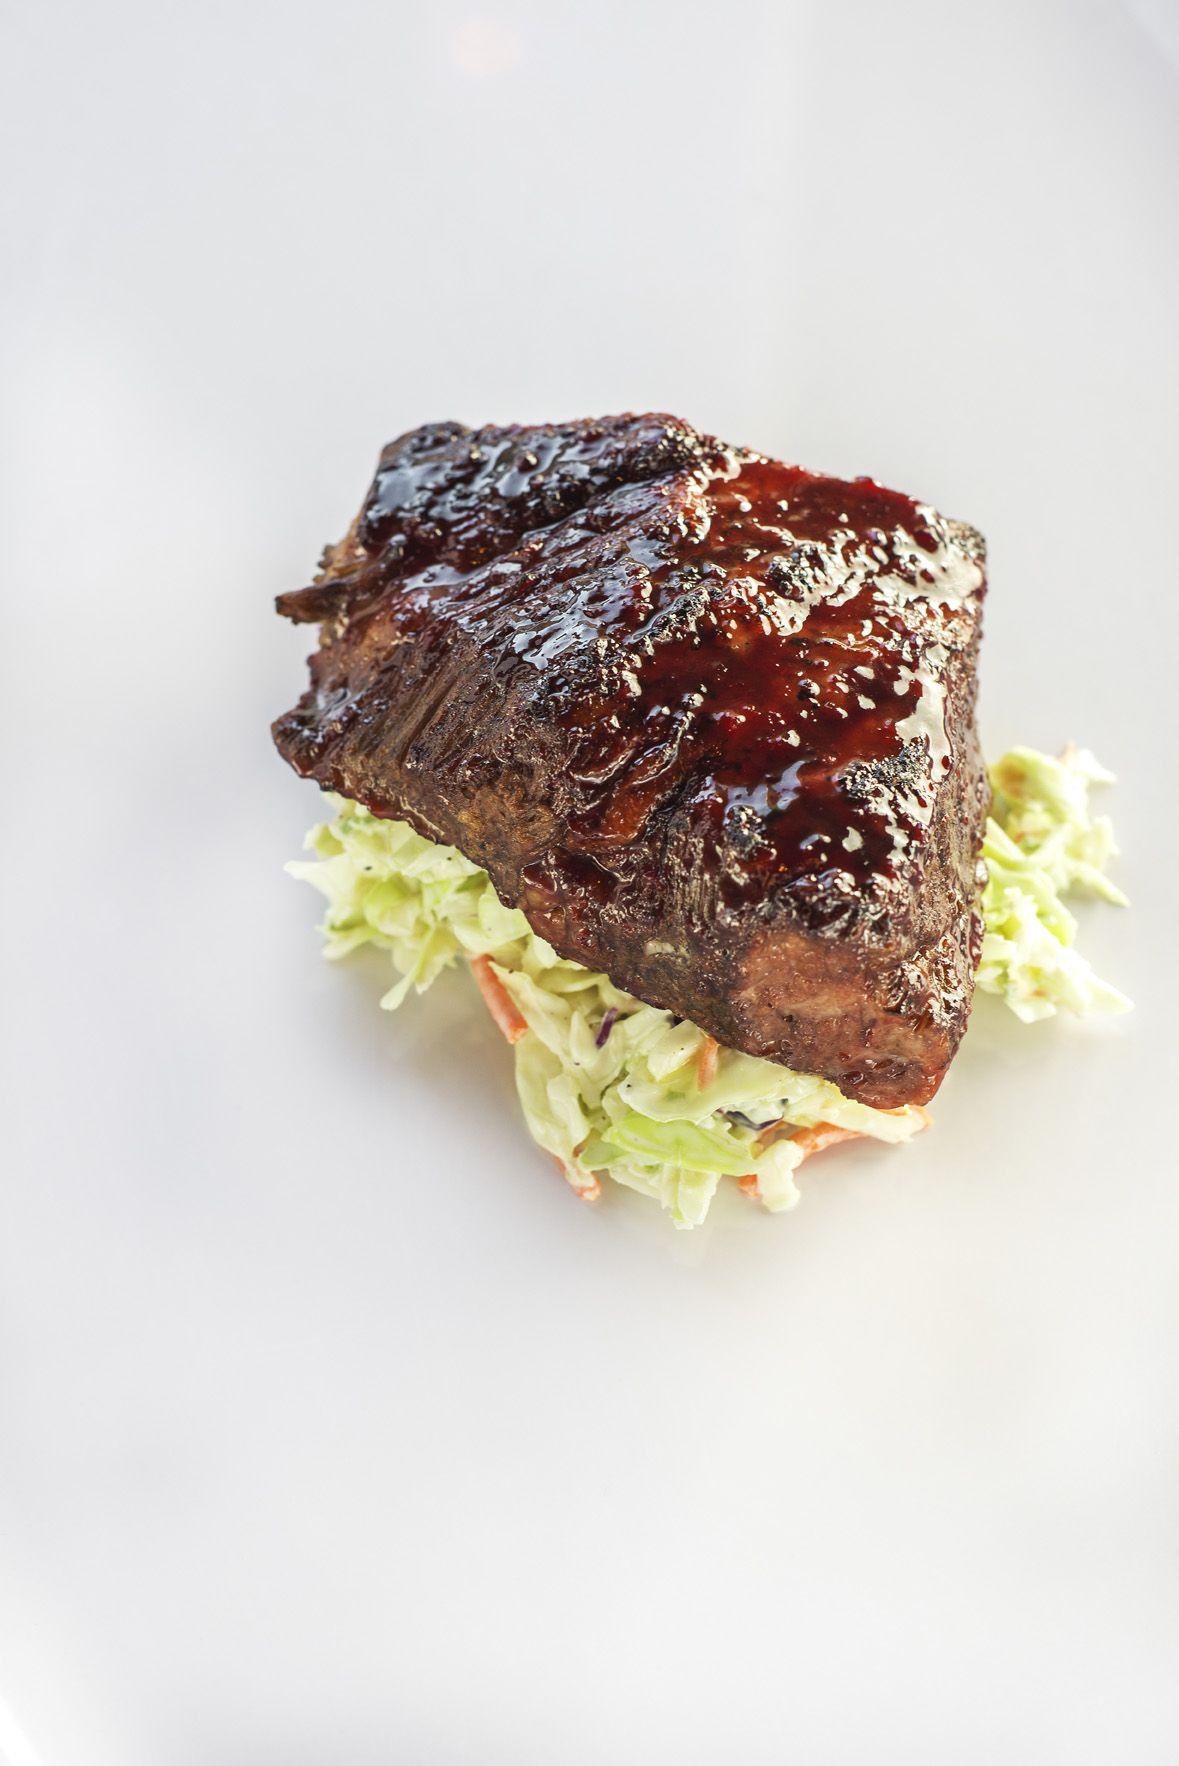 soby u0027s braised beef short ribs with cheerwine bbq sauce soby u0027s